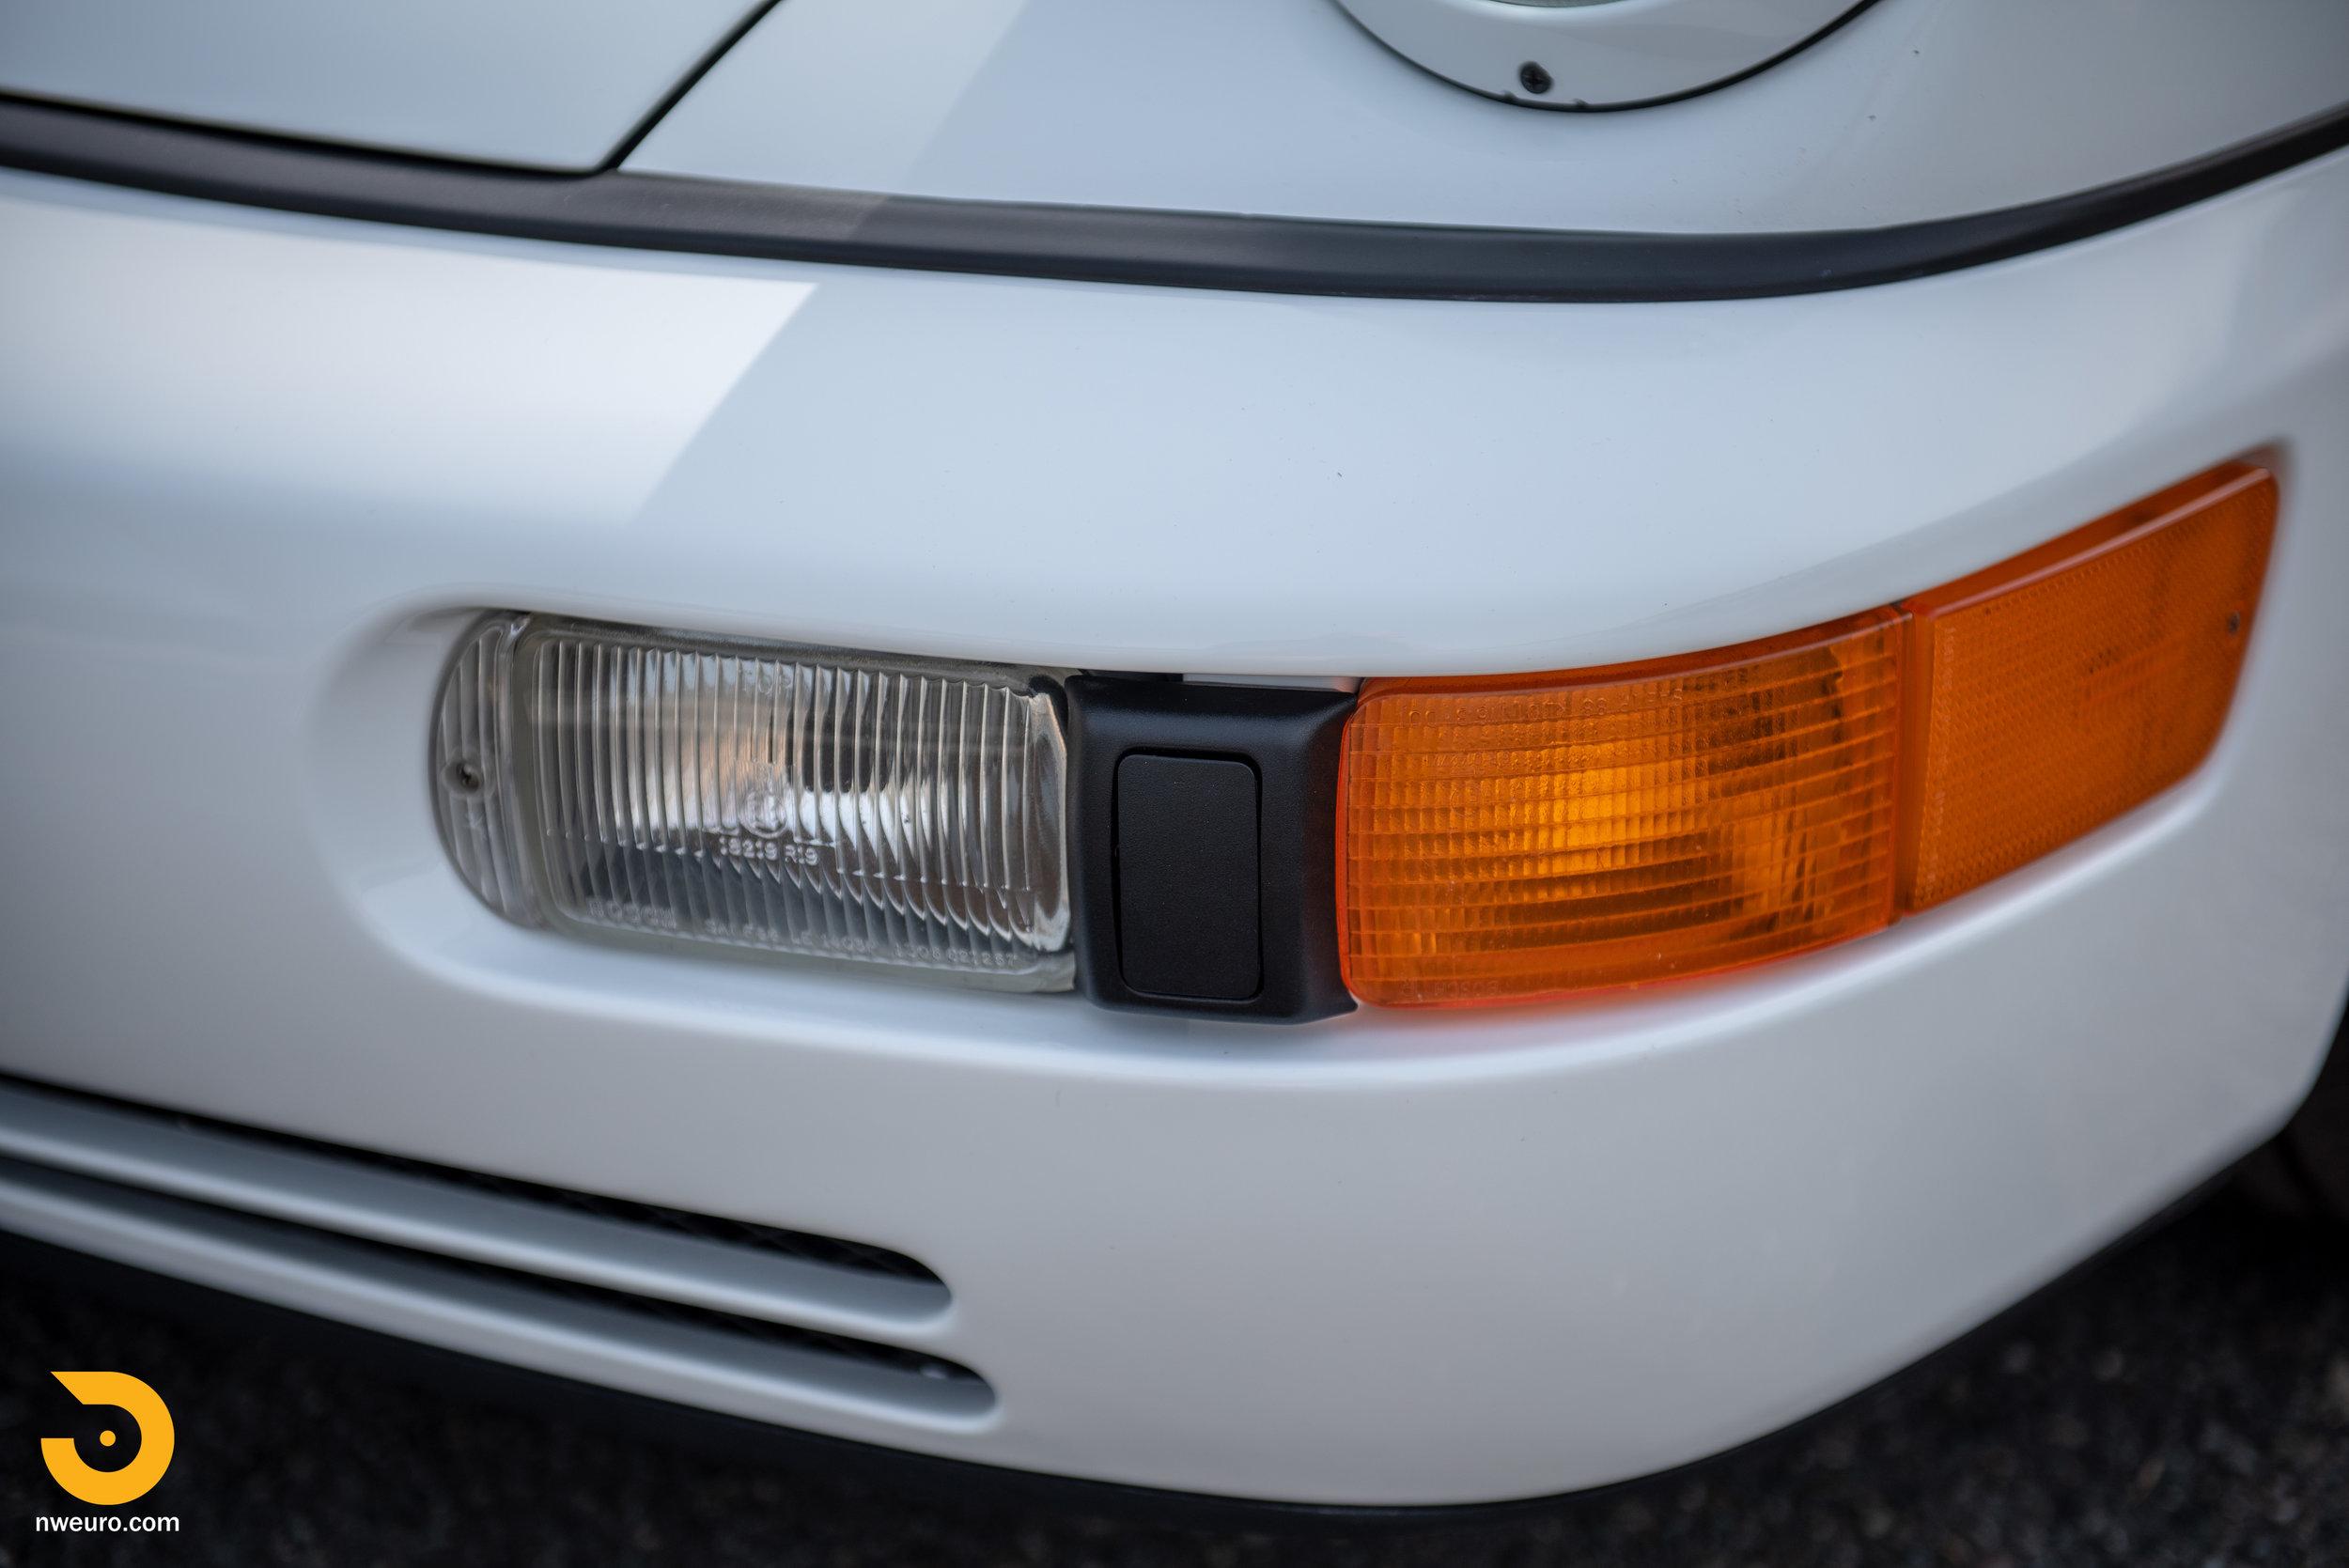 1993 Porsche RS America White-5.jpg